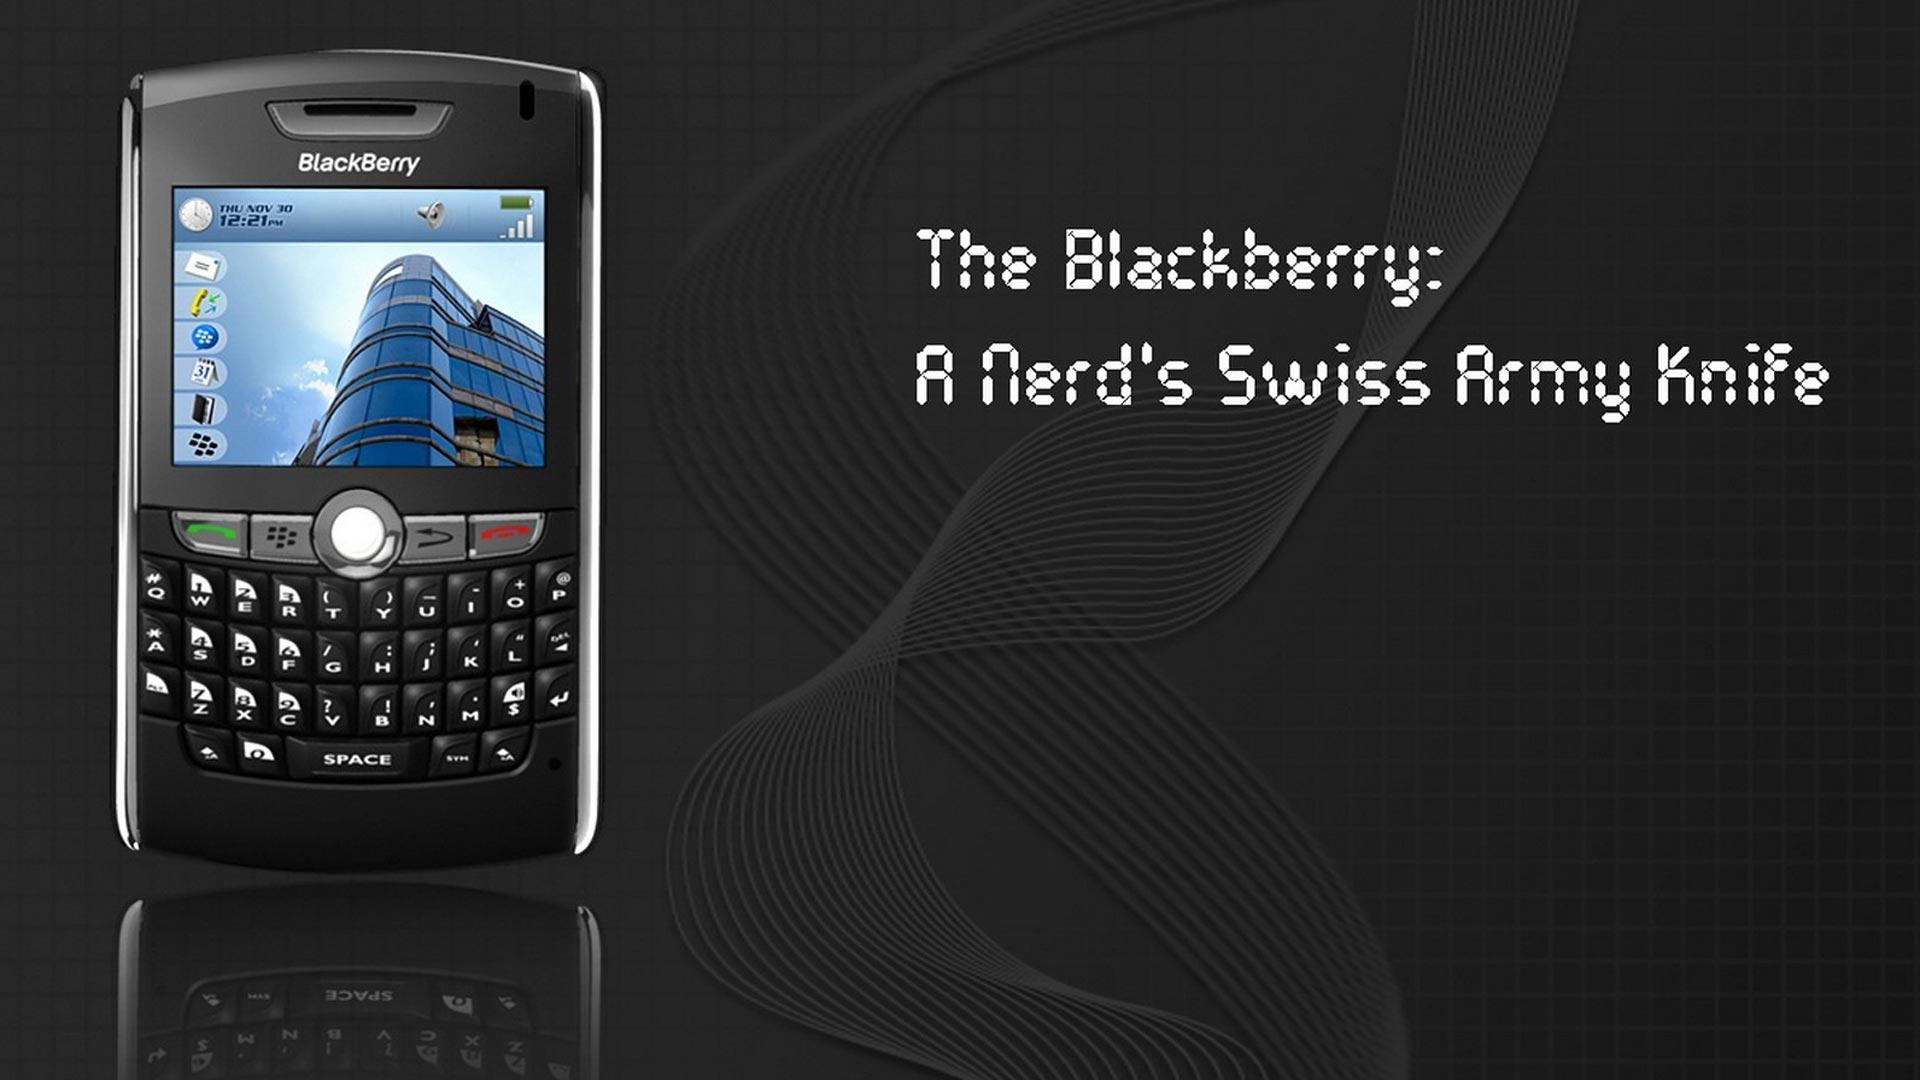 Blackberry wallpapers photos and desktop backgrounds up to 8k blackberry wallpaper blackberry curve 3g hd voltagebd Gallery